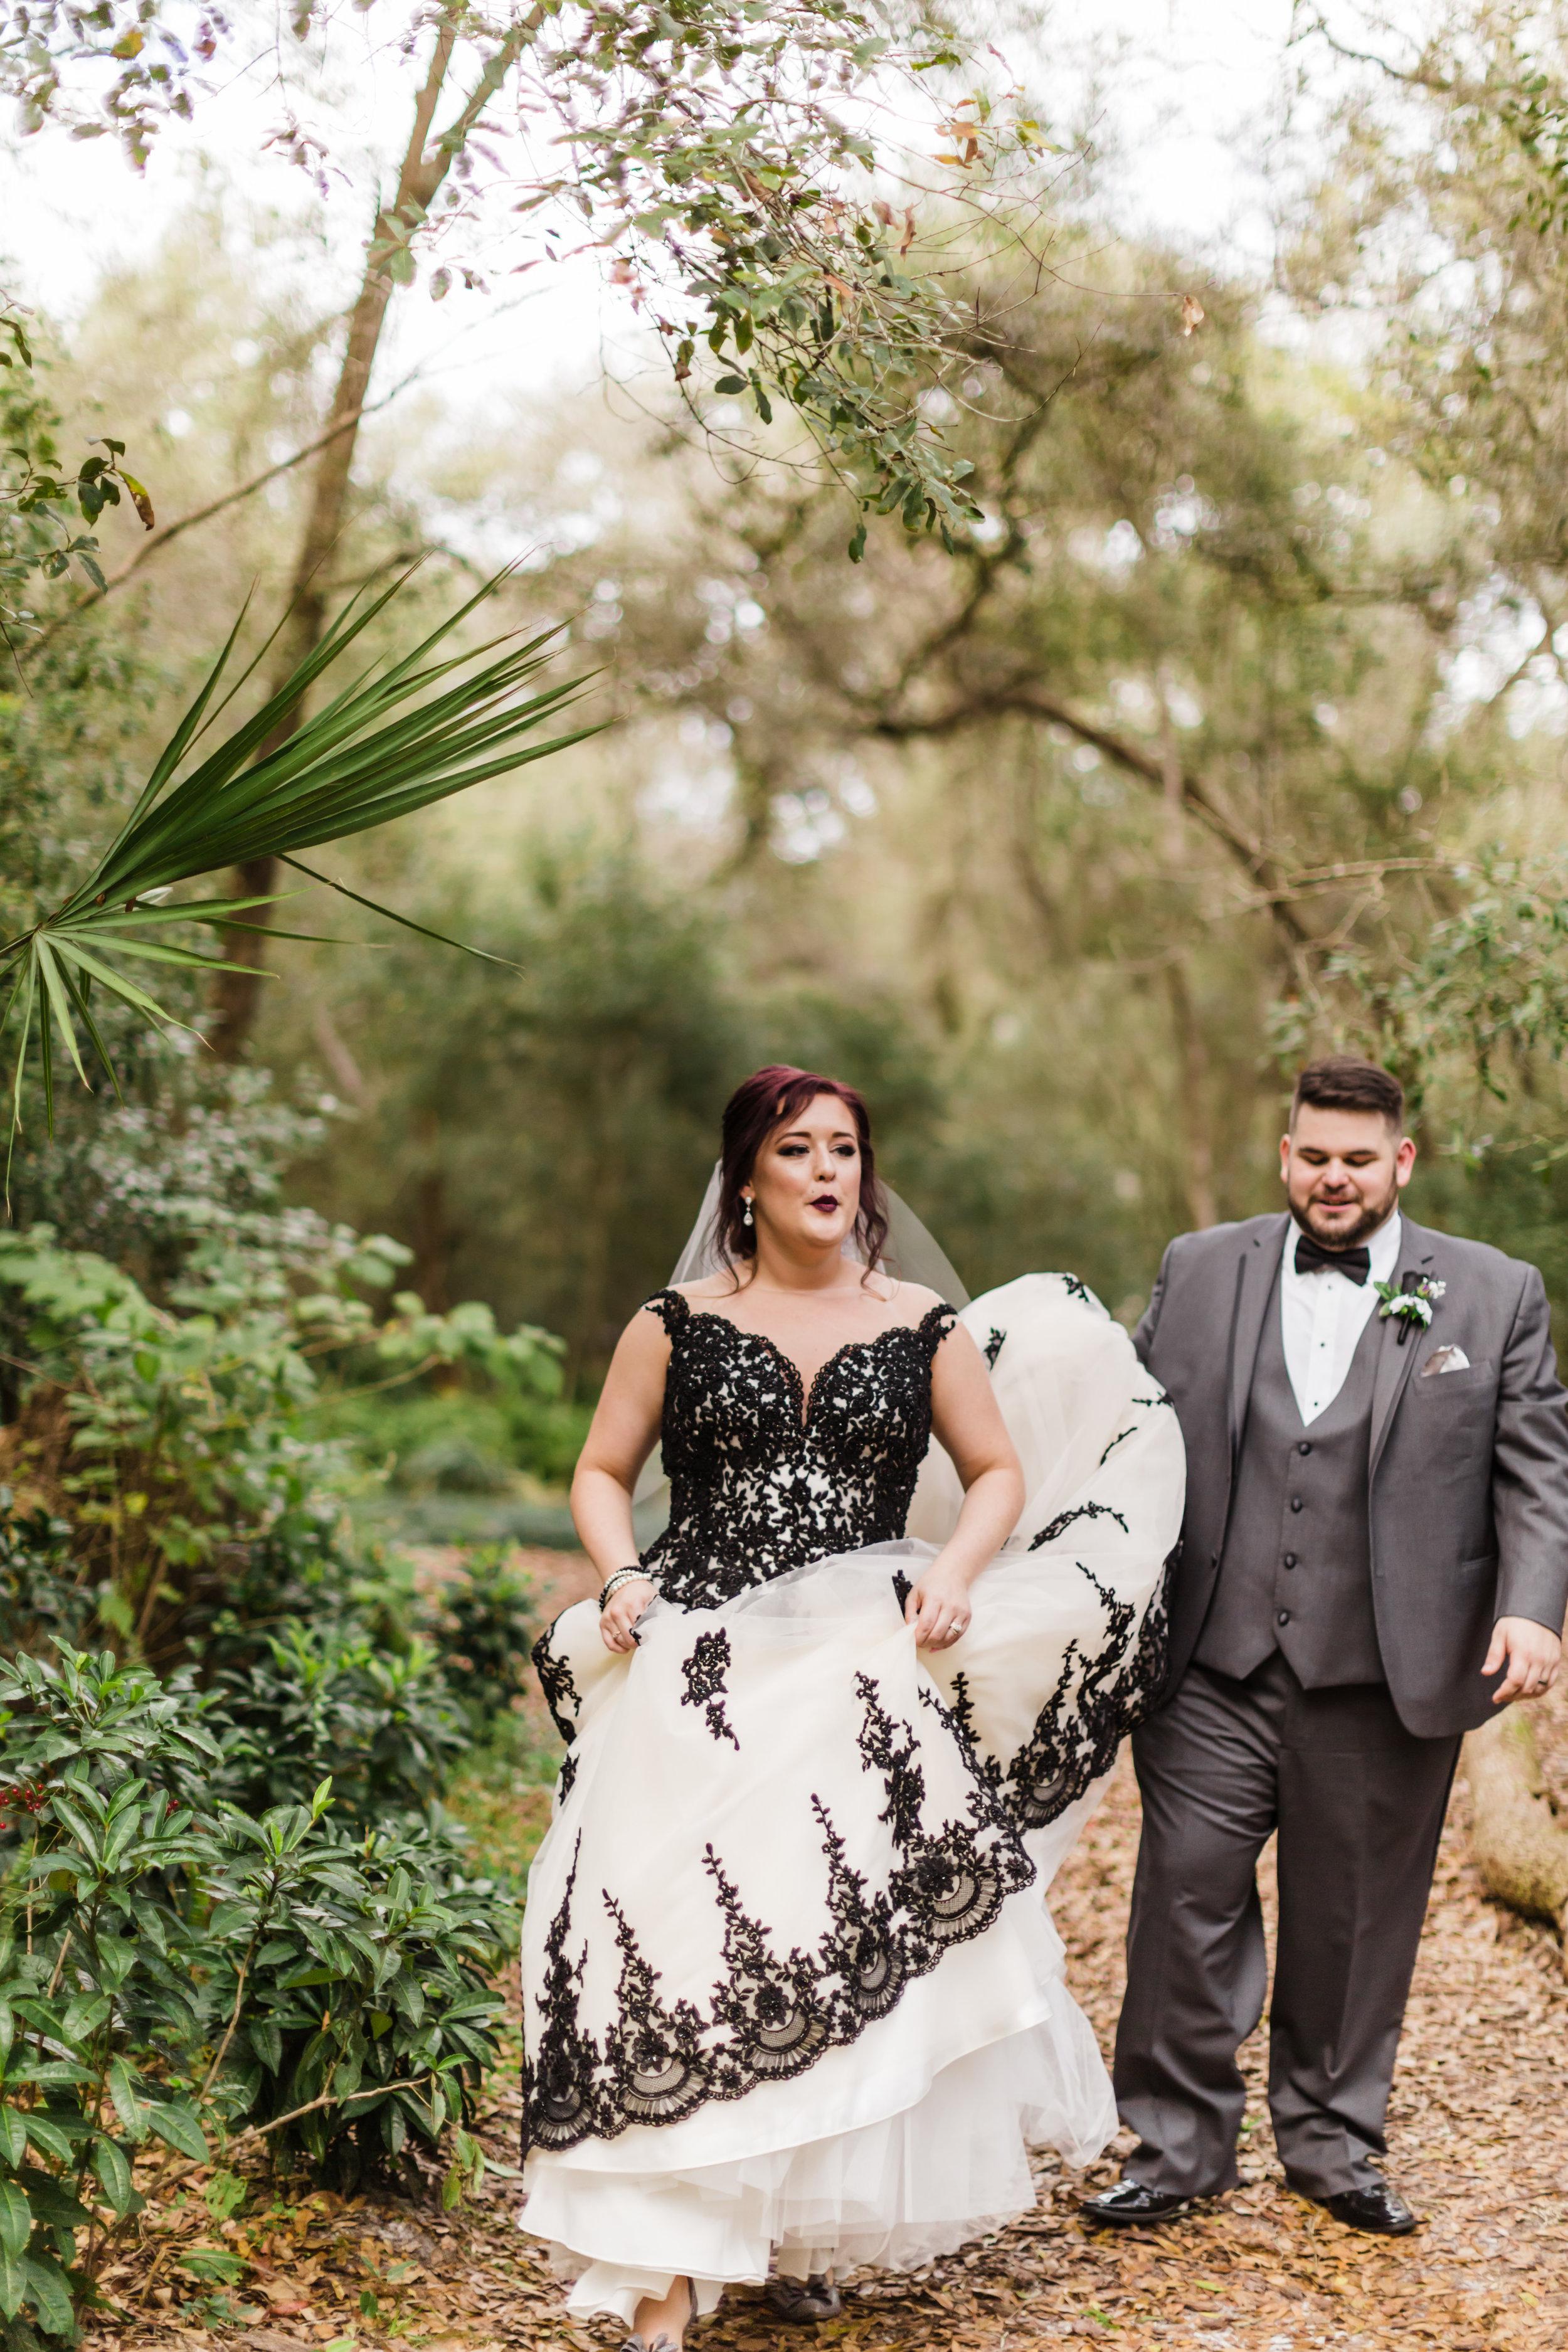 2019.01.12 Ashley and Nathan Bridle Oaks Wedding (671 of 1091).jpg